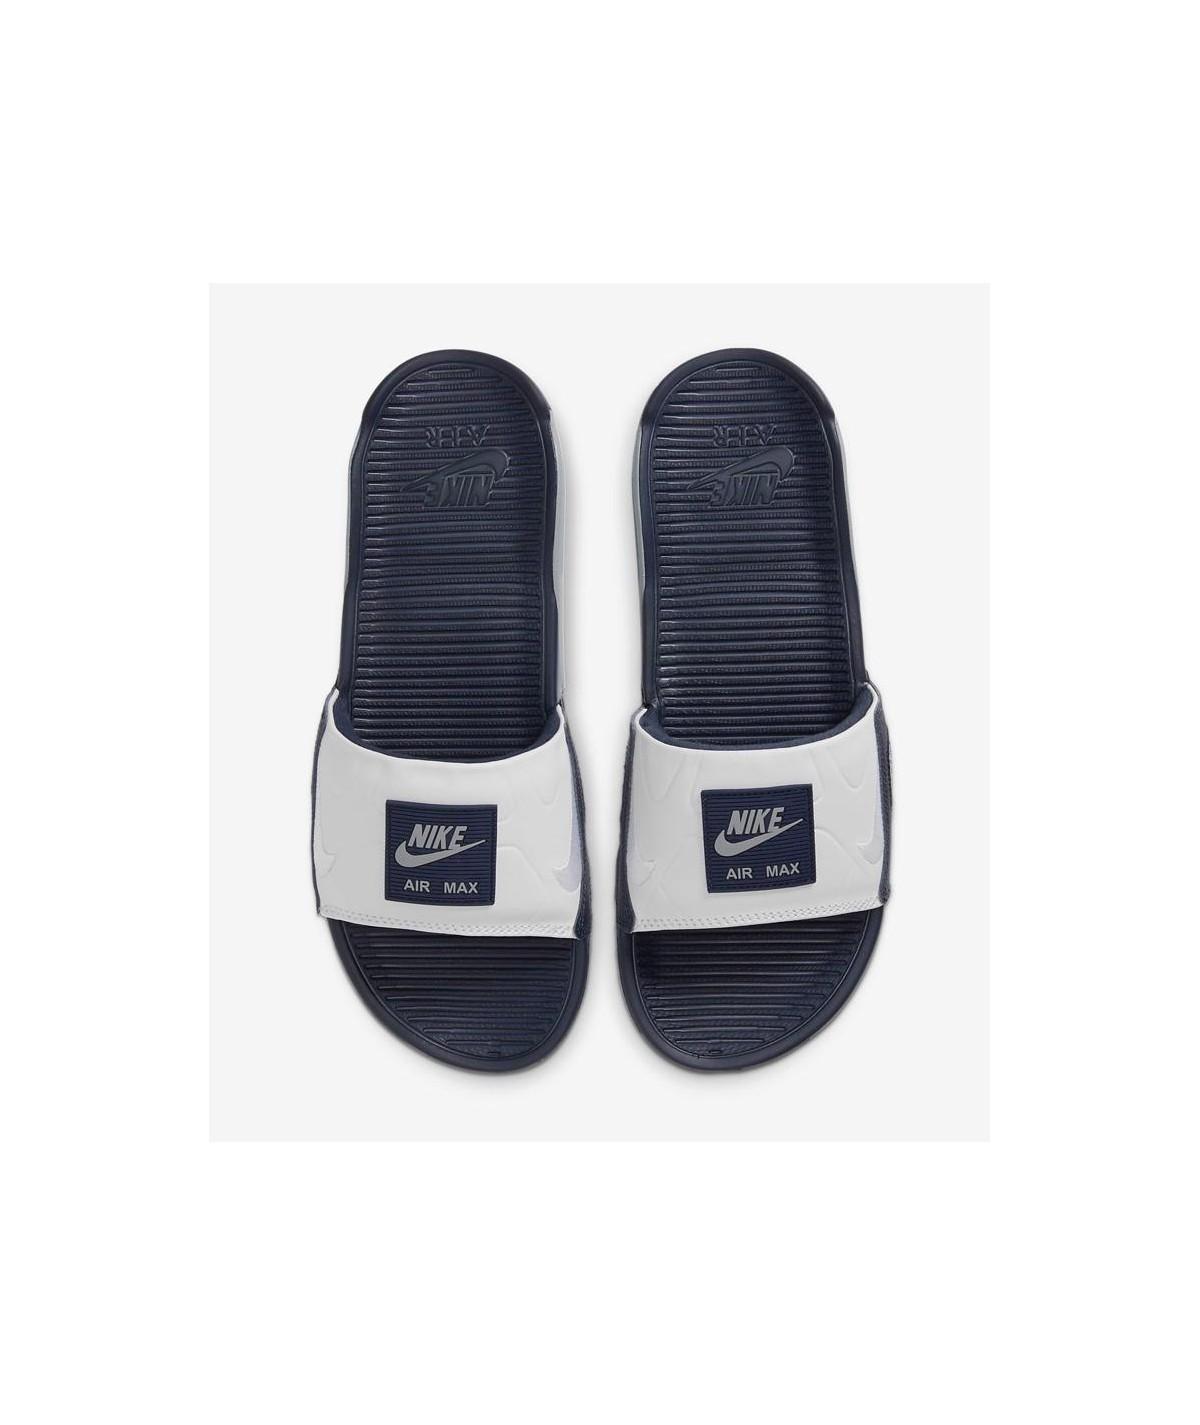 Nike Air Max 90 Sandale